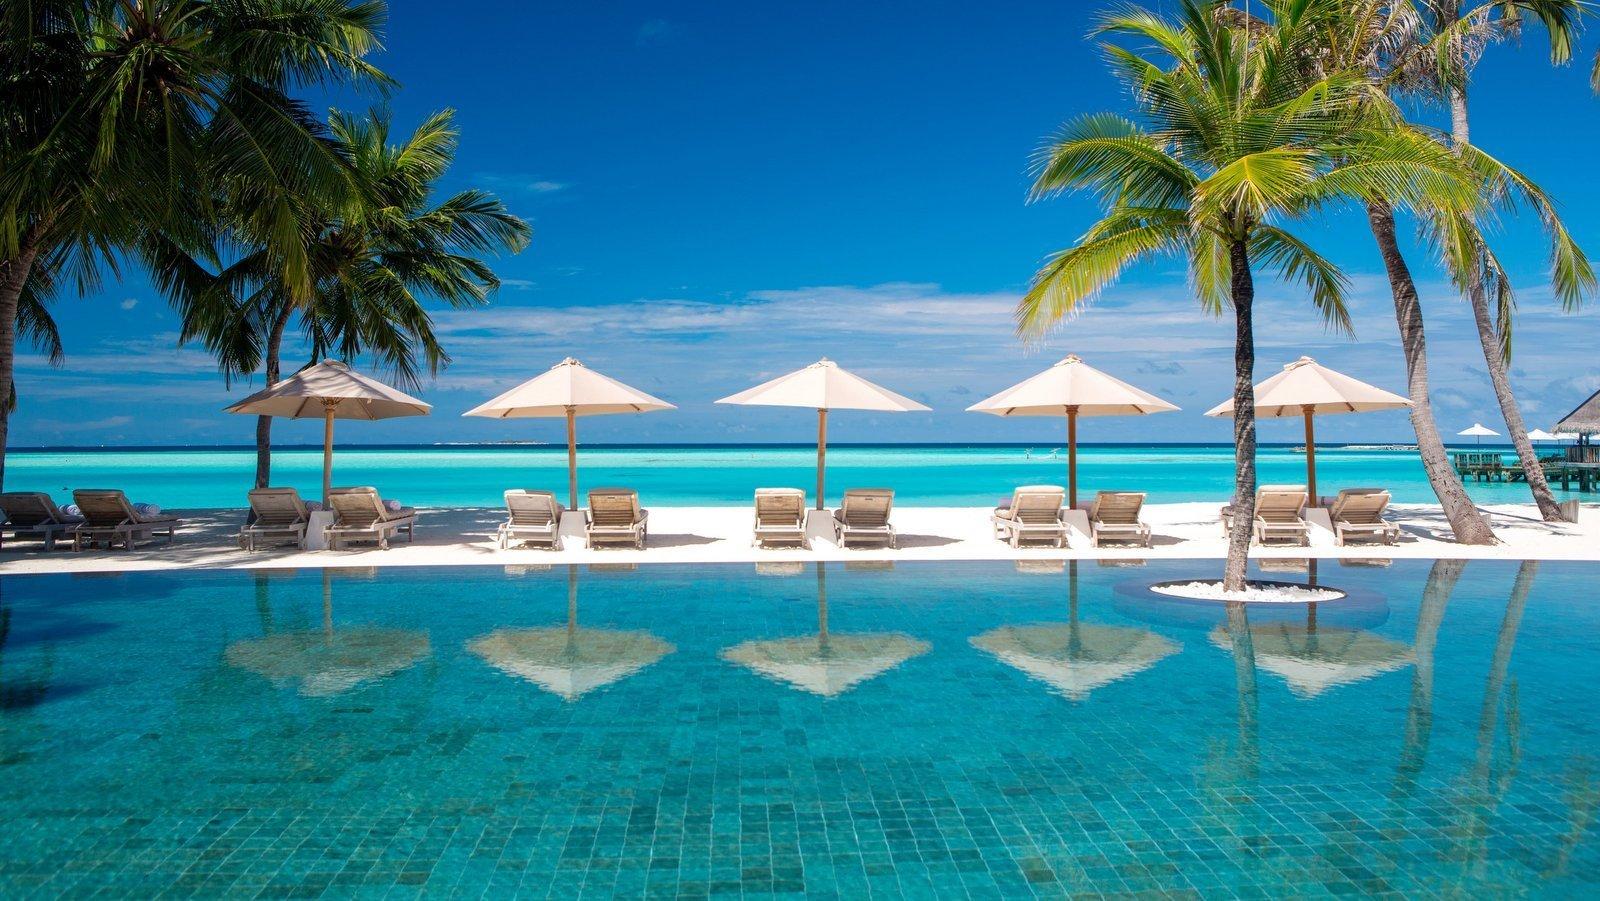 Мальдивы, отель Gili Lankanfushi Maldives, бассейн